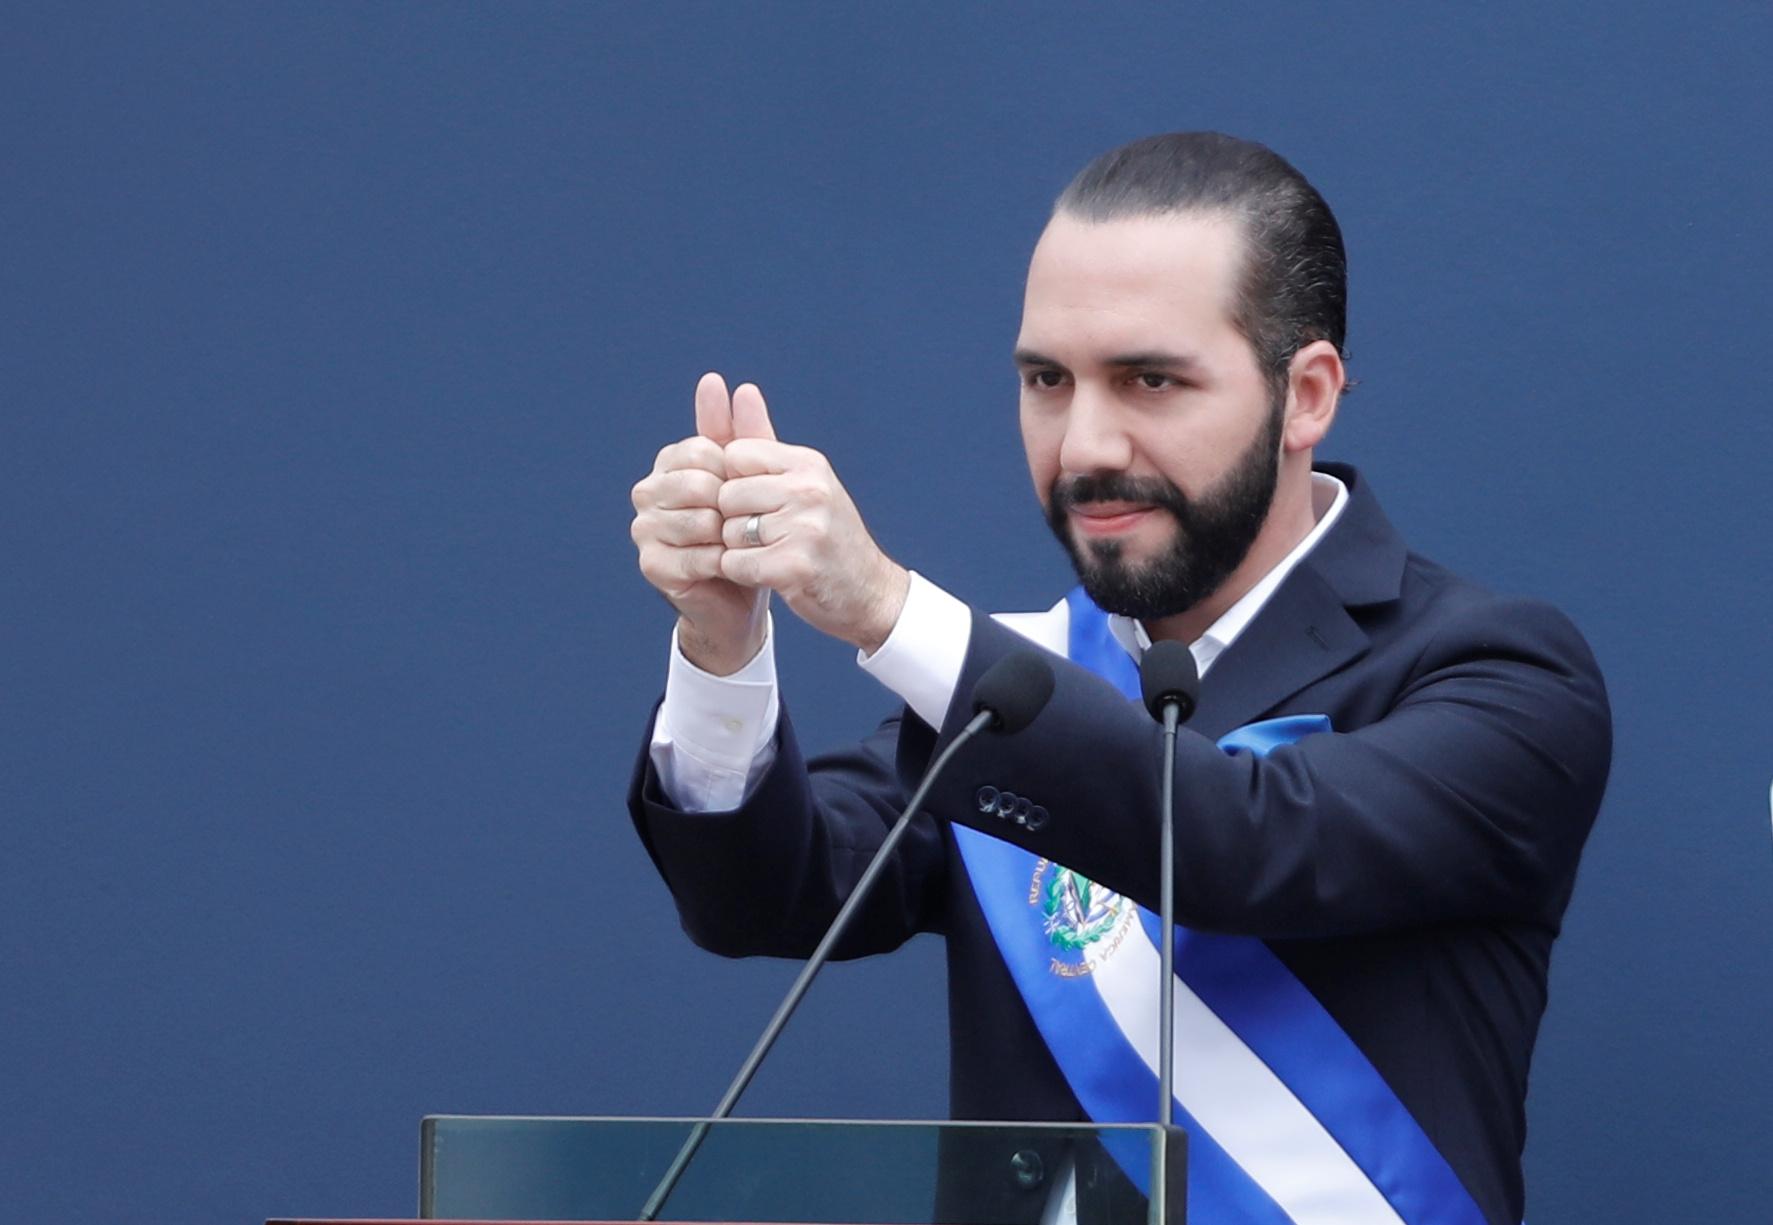 New Salvadoran President Nayib Bukele speaks after receiving the presidential sash during a swearing-in ceremony in San Salvador, El Salvador June 1, 2019. REUTERS/Jose Cabezas